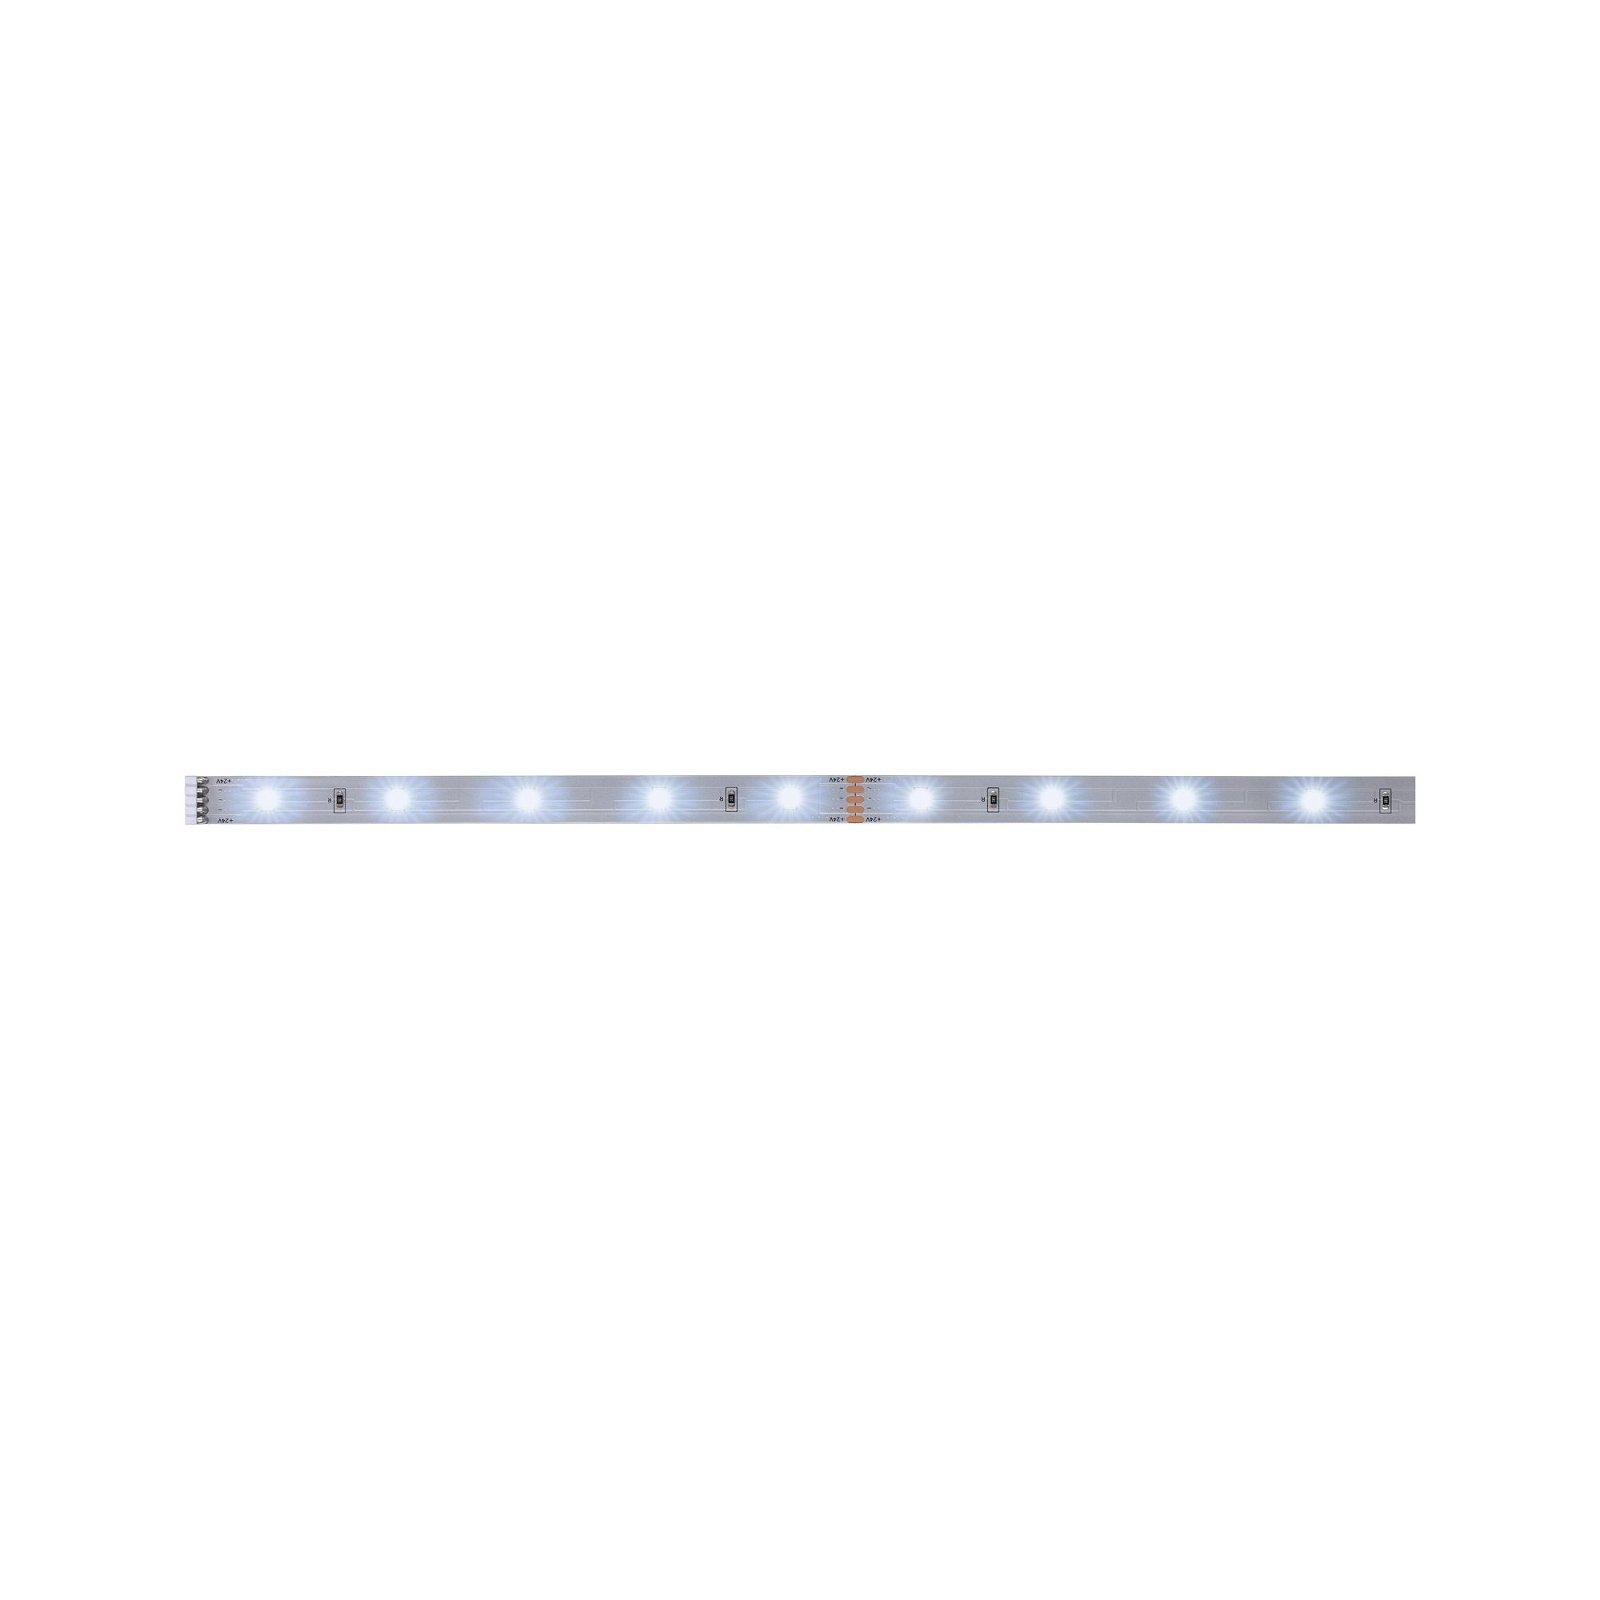 MaxLED 250 LED Strip Daglichtwit 1m 4W 300lm 6500K